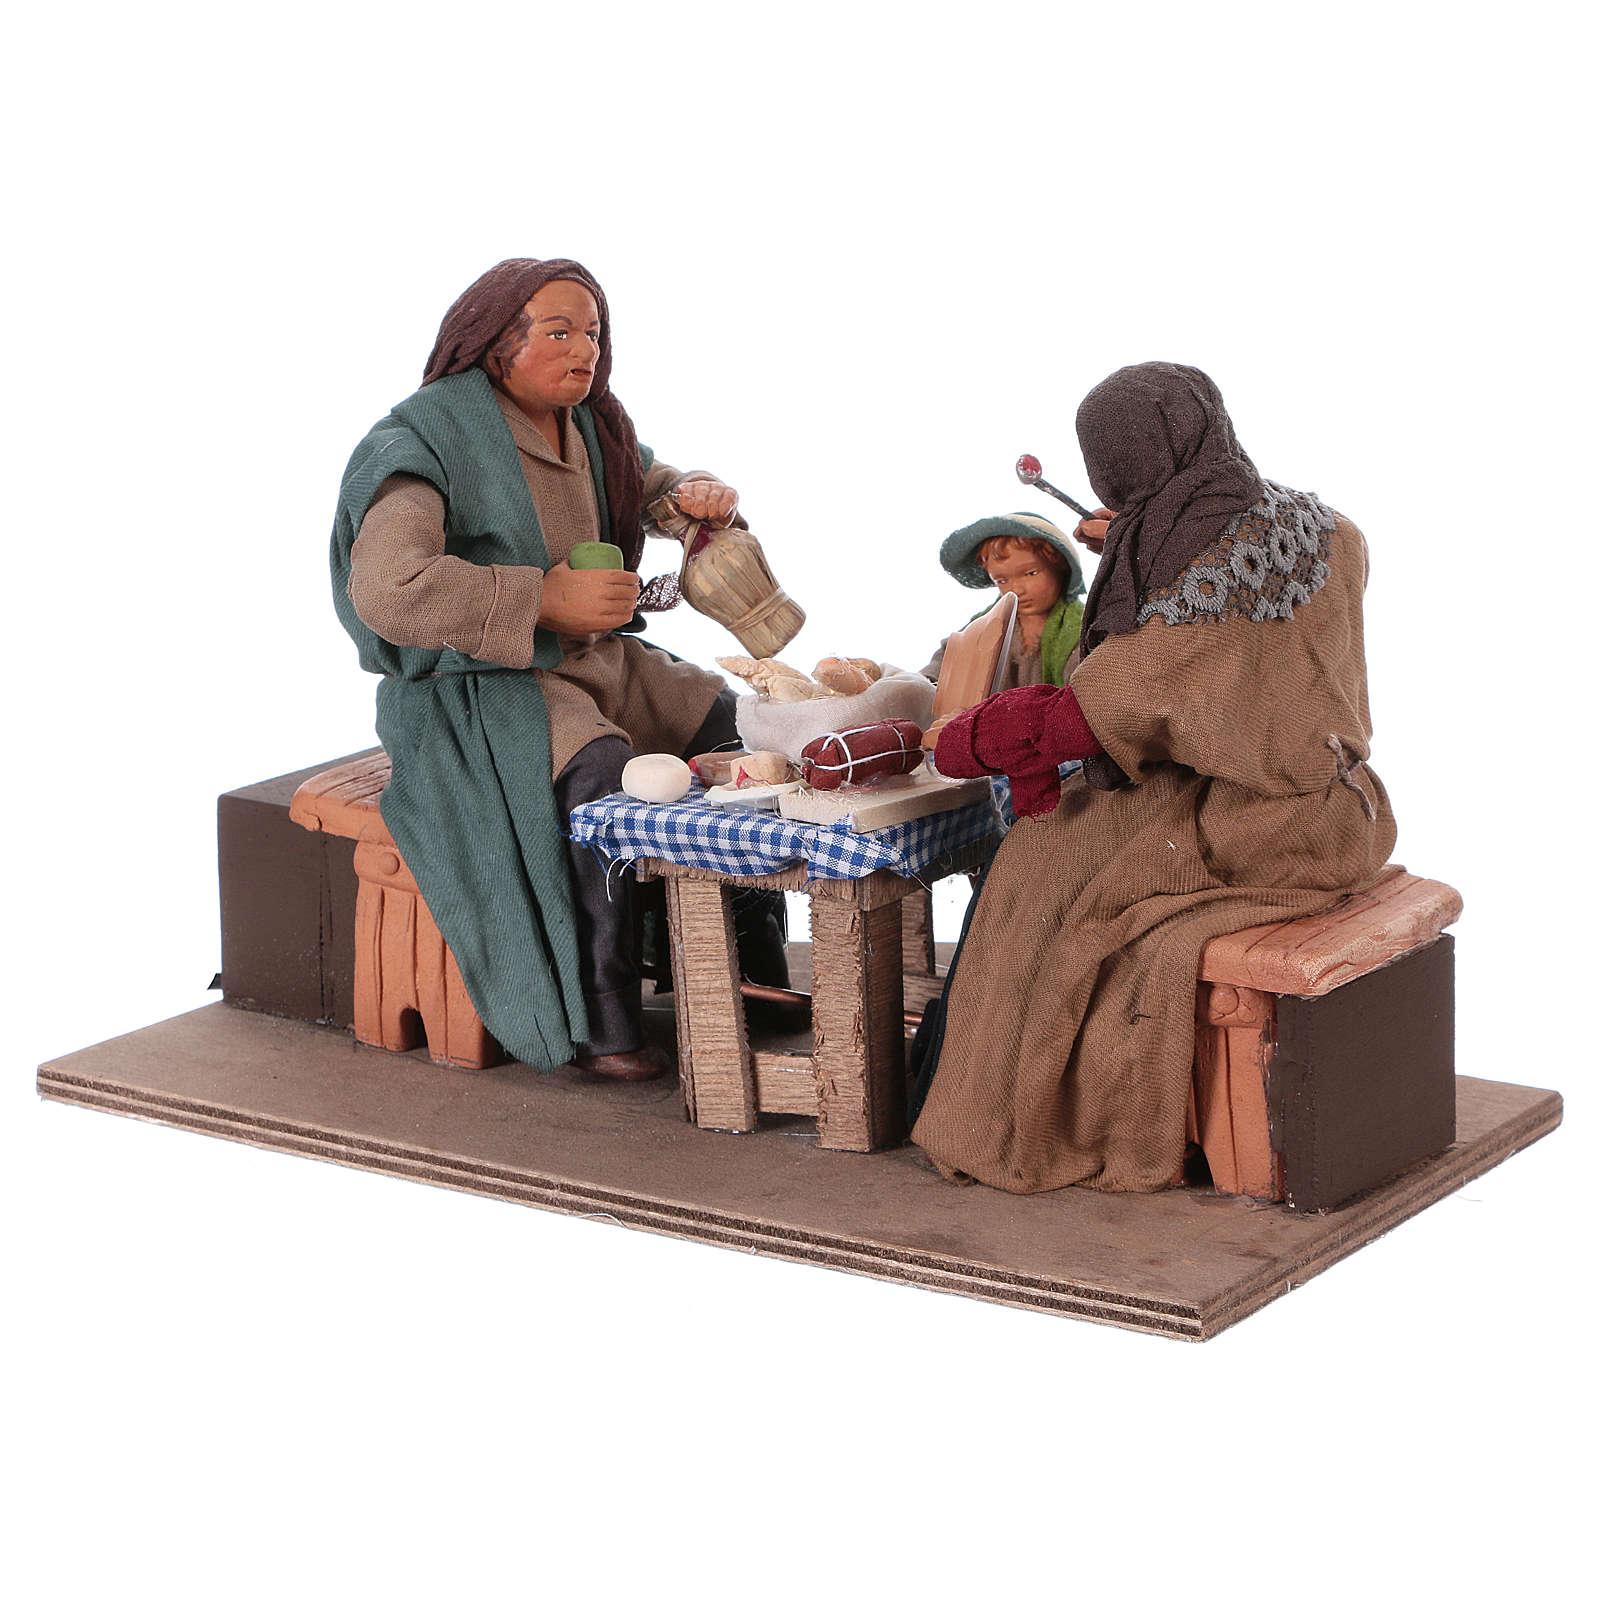 Moving family with child 24 cm for Neapolitan Nativity Scene 4